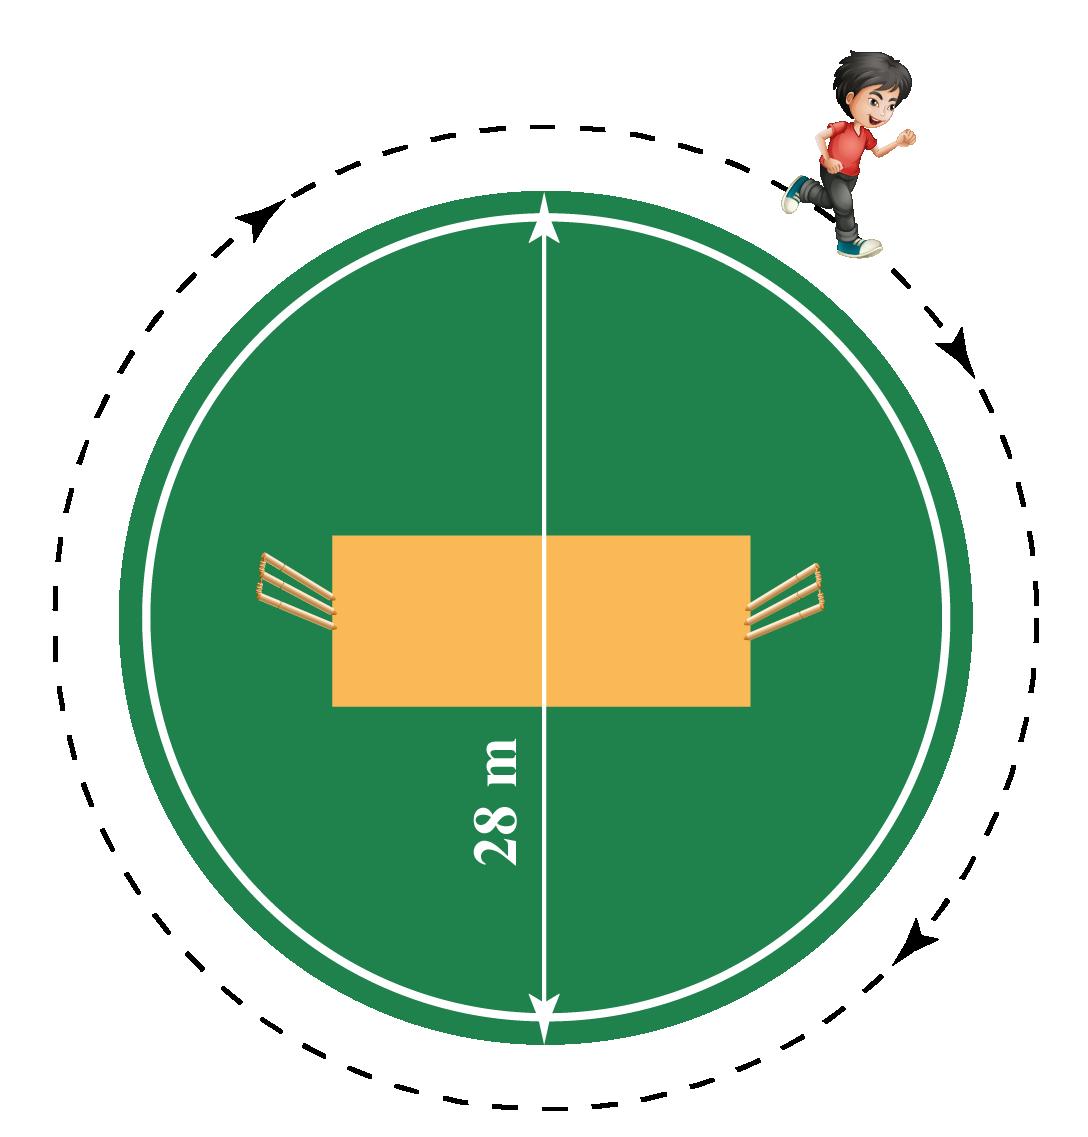 Circular cricket field of diameter 28 m.